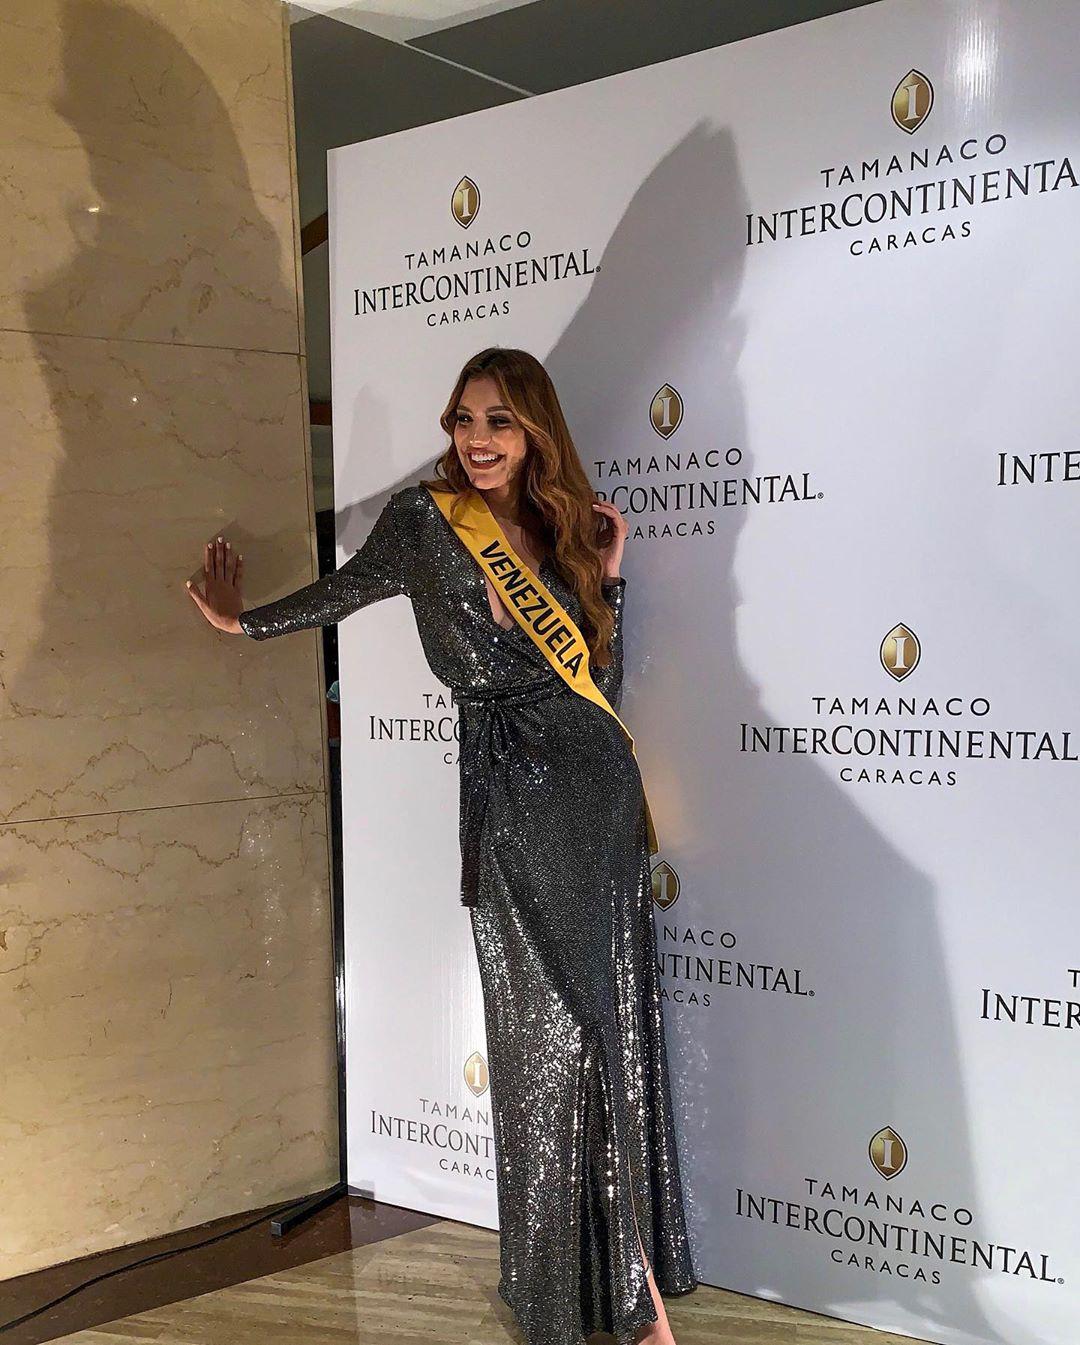 lourdes valentina figuera, miss grand international 2019. - Página 5 70530110